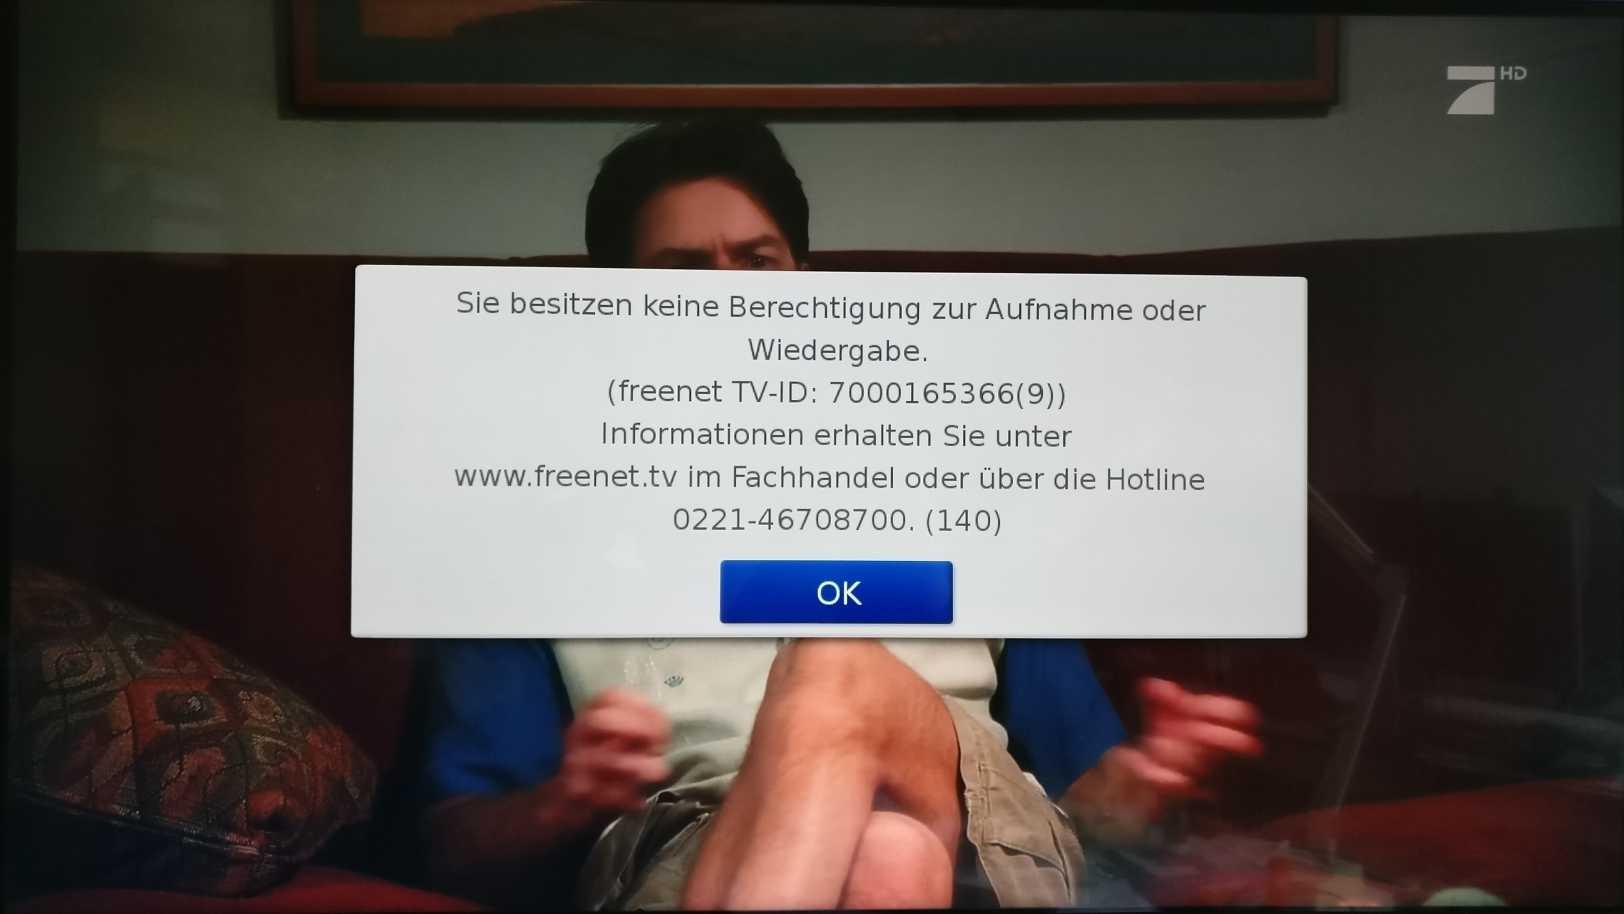 DVB-T2 HD: Erst Anruf, dann Aufnahme